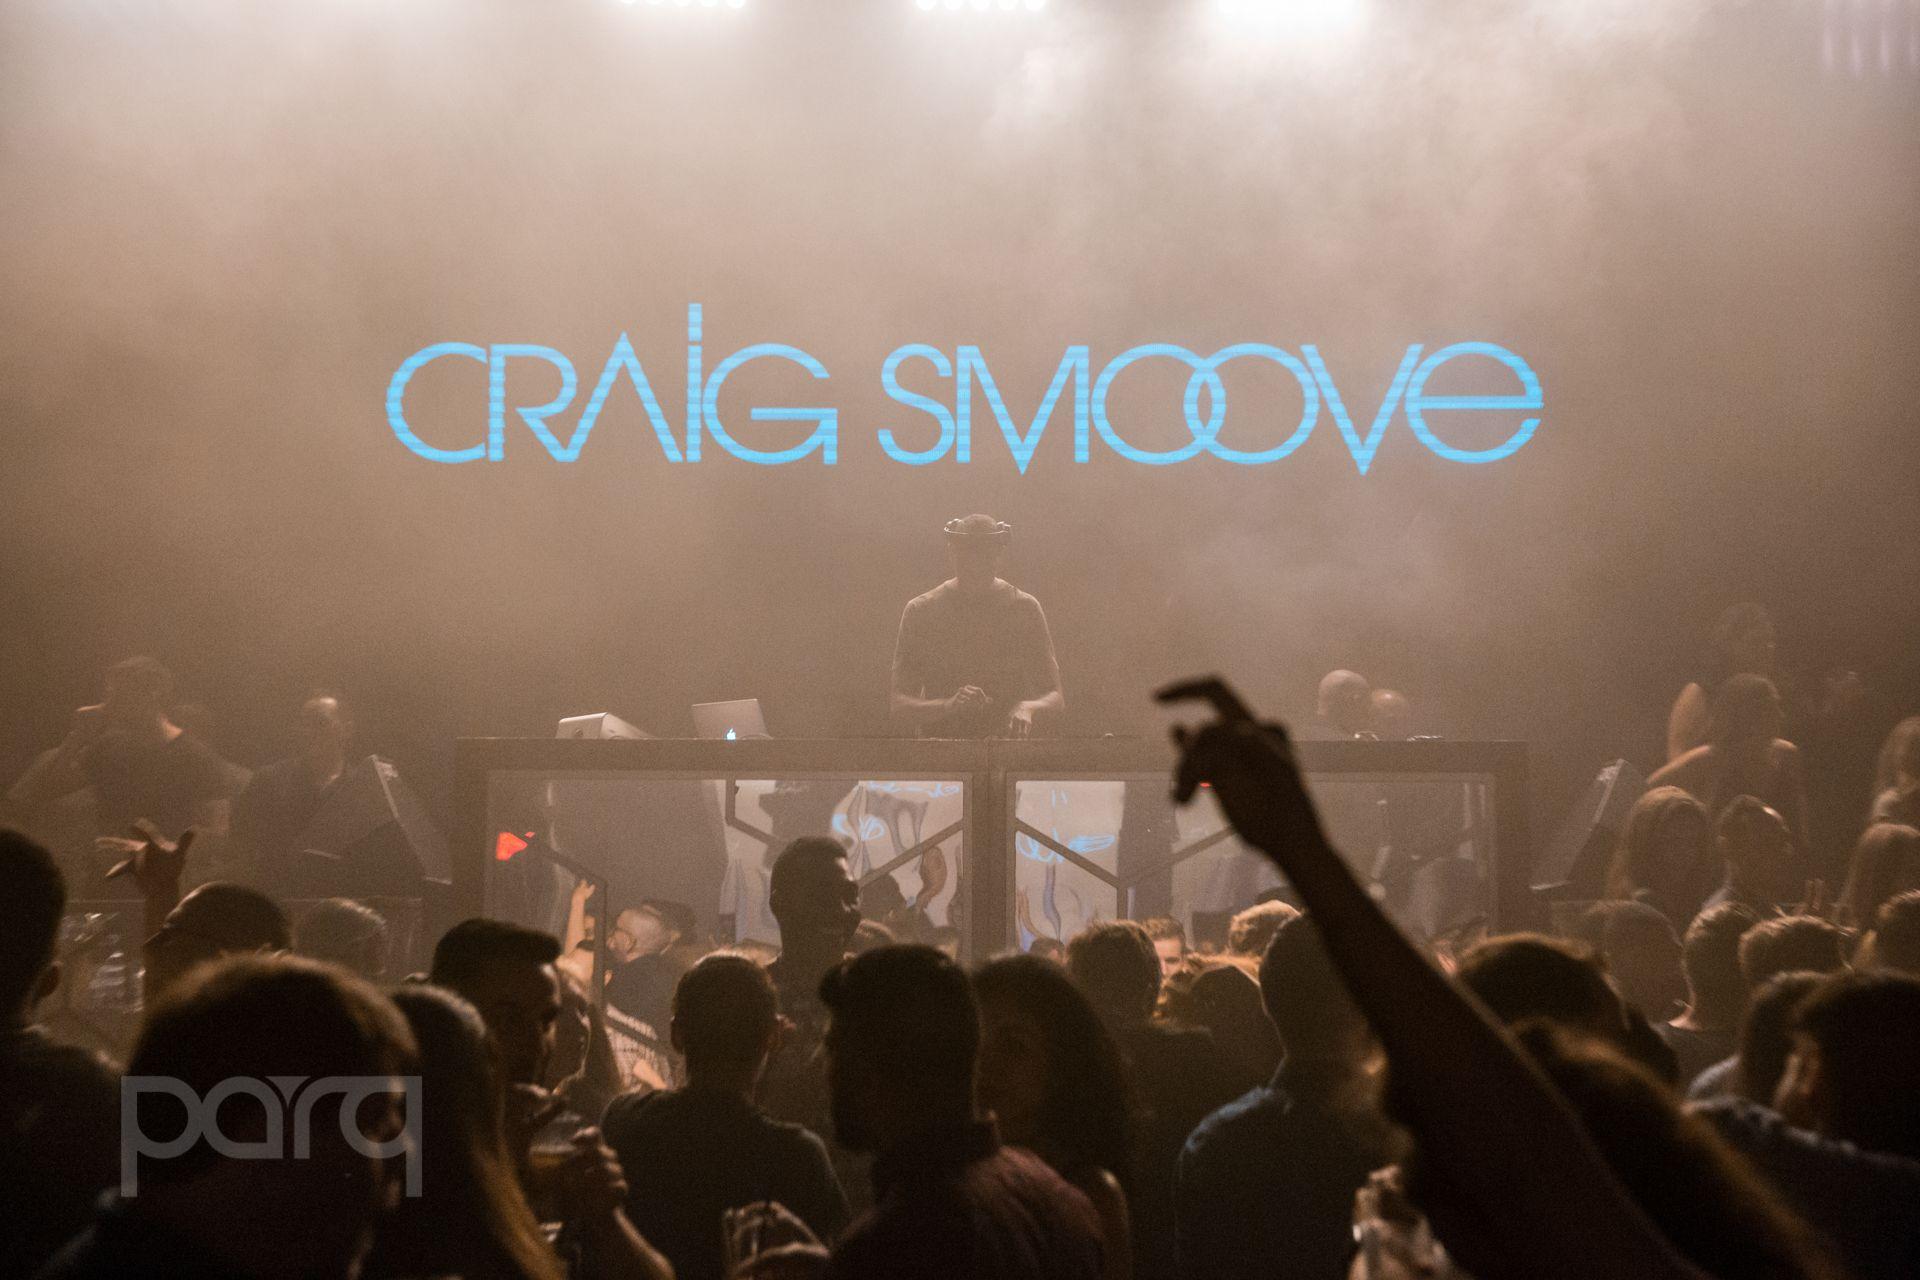 07.07.17  Craig Smoove-1.jpg